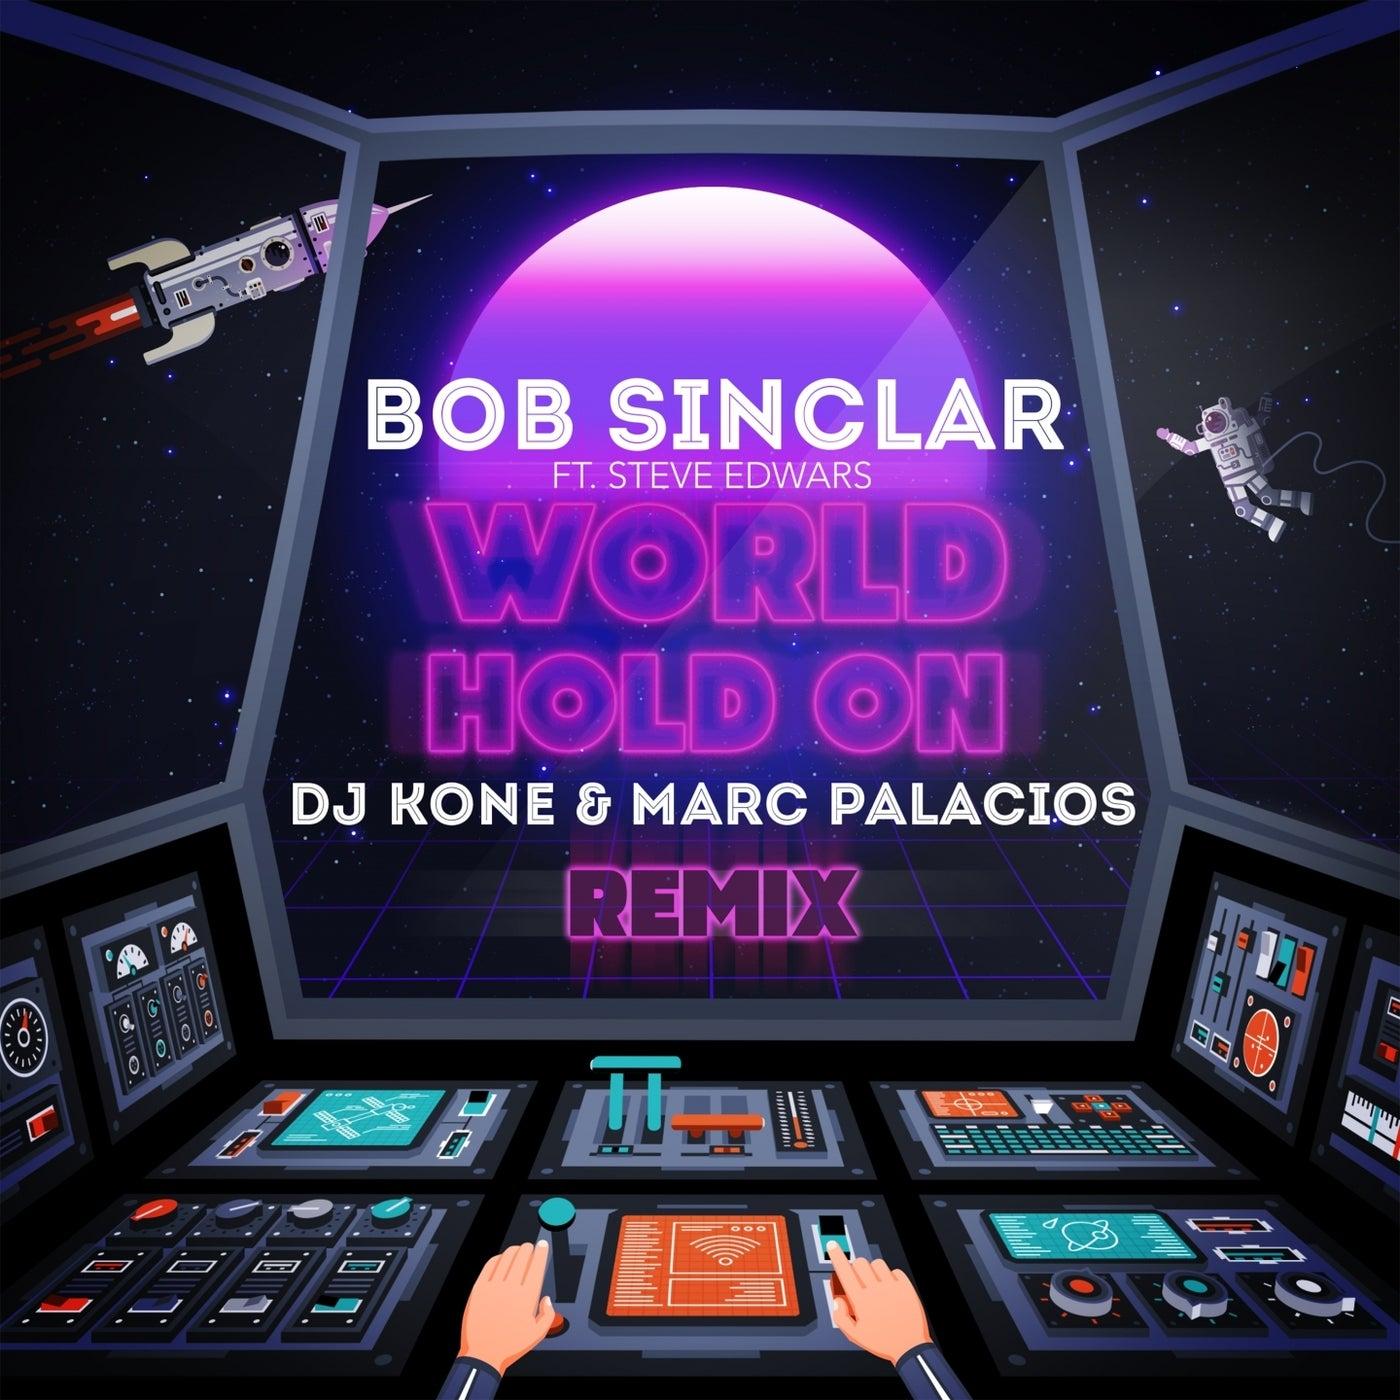 World Hold On feat. Steve Edwards (DJ Kone & Marc Palacios Extended Mix)